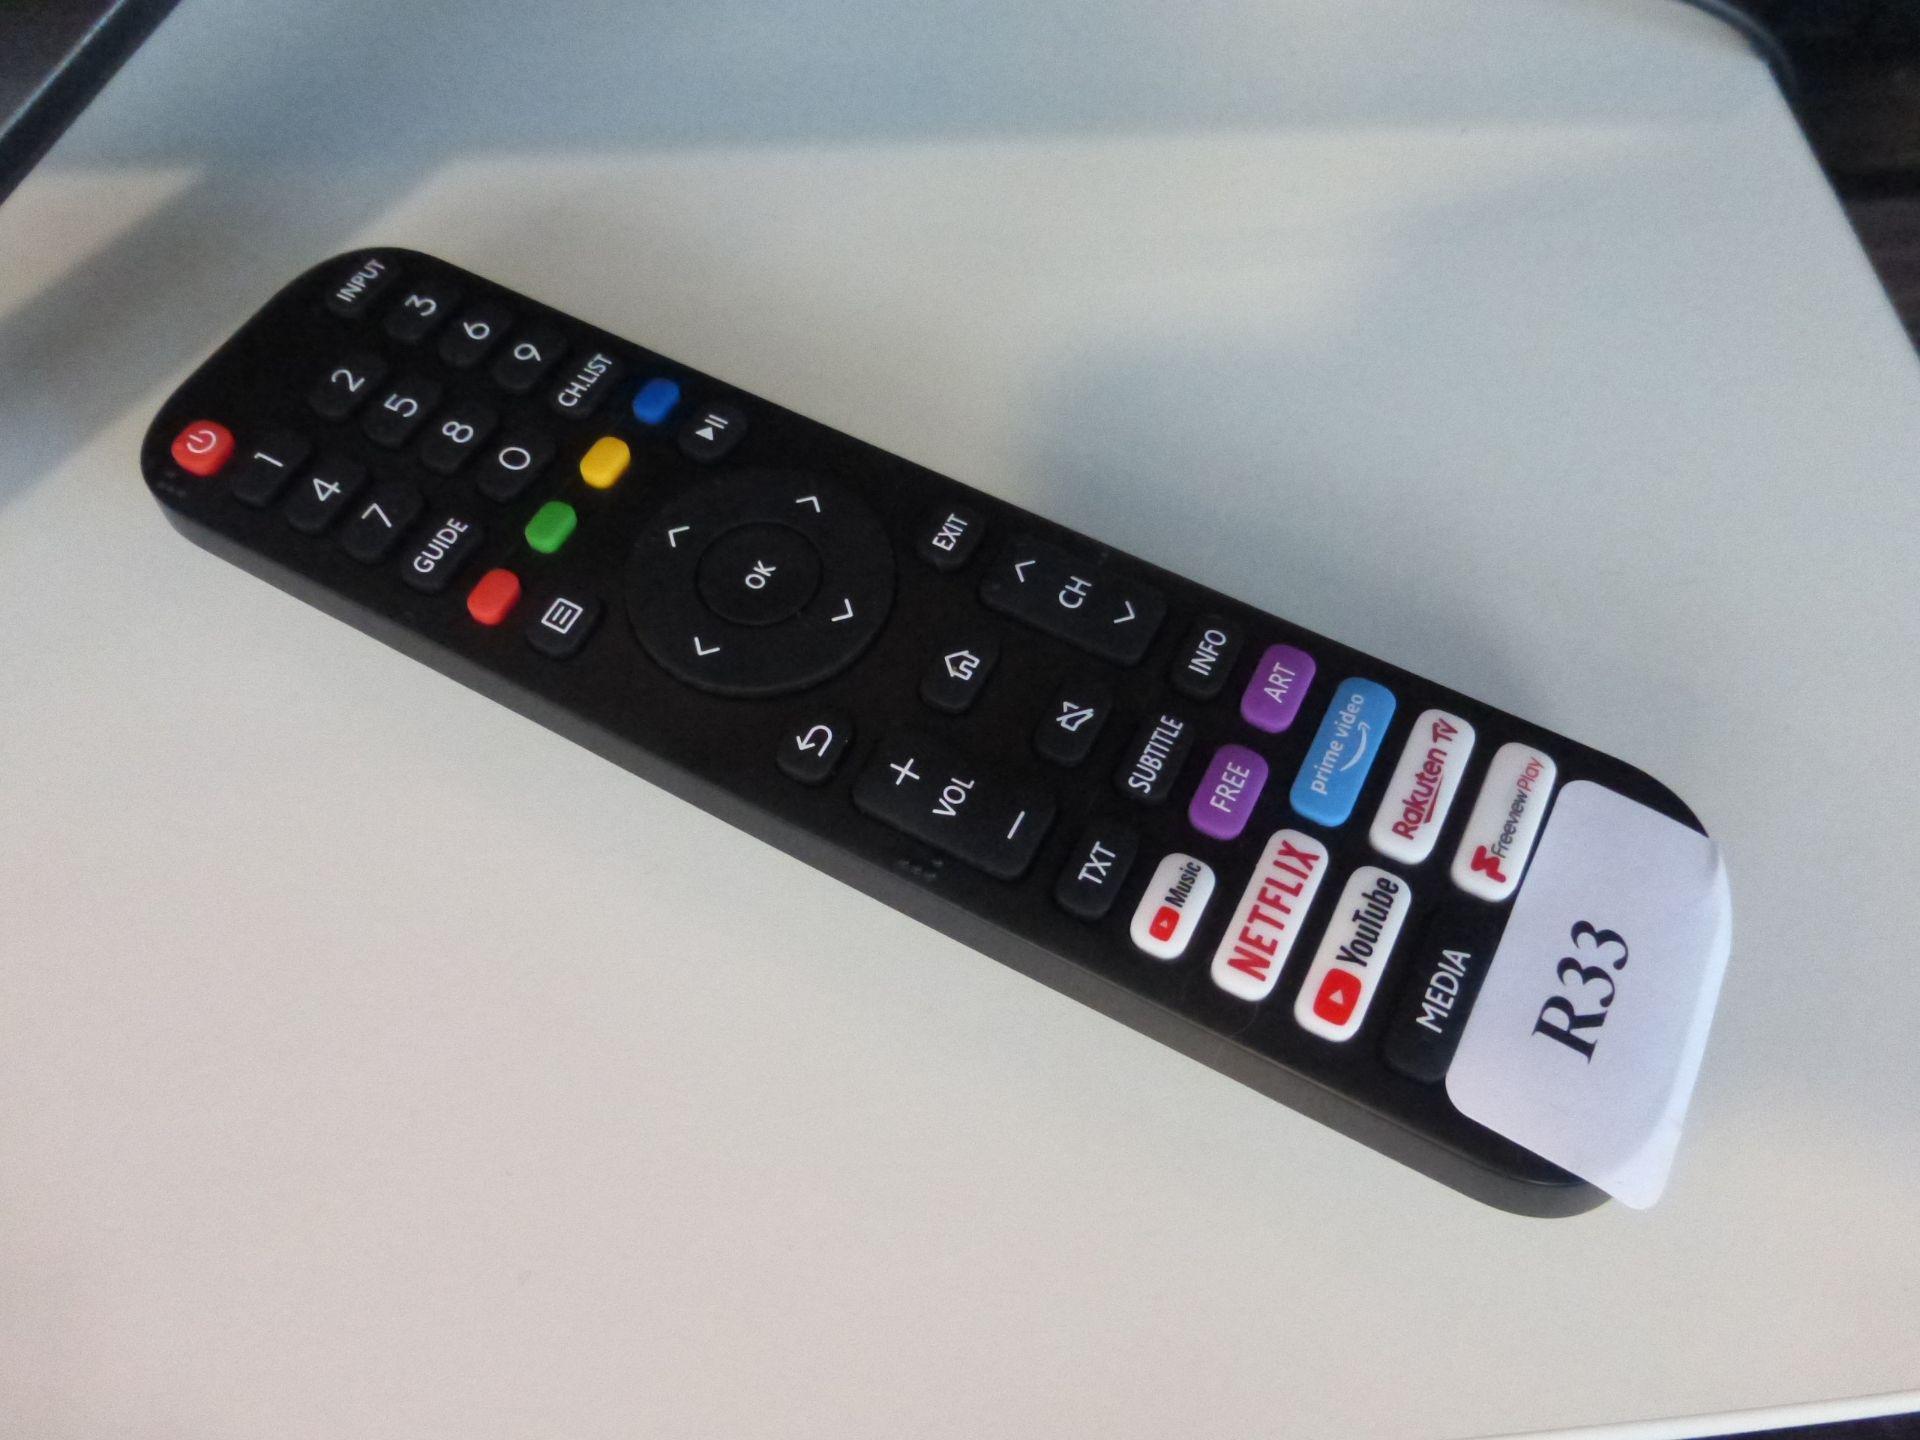 Hisense 55'' 4K TV Model: 55AE7400FTUK, includes remote (R33) and box (B54) Screen has no visible - Image 2 of 2